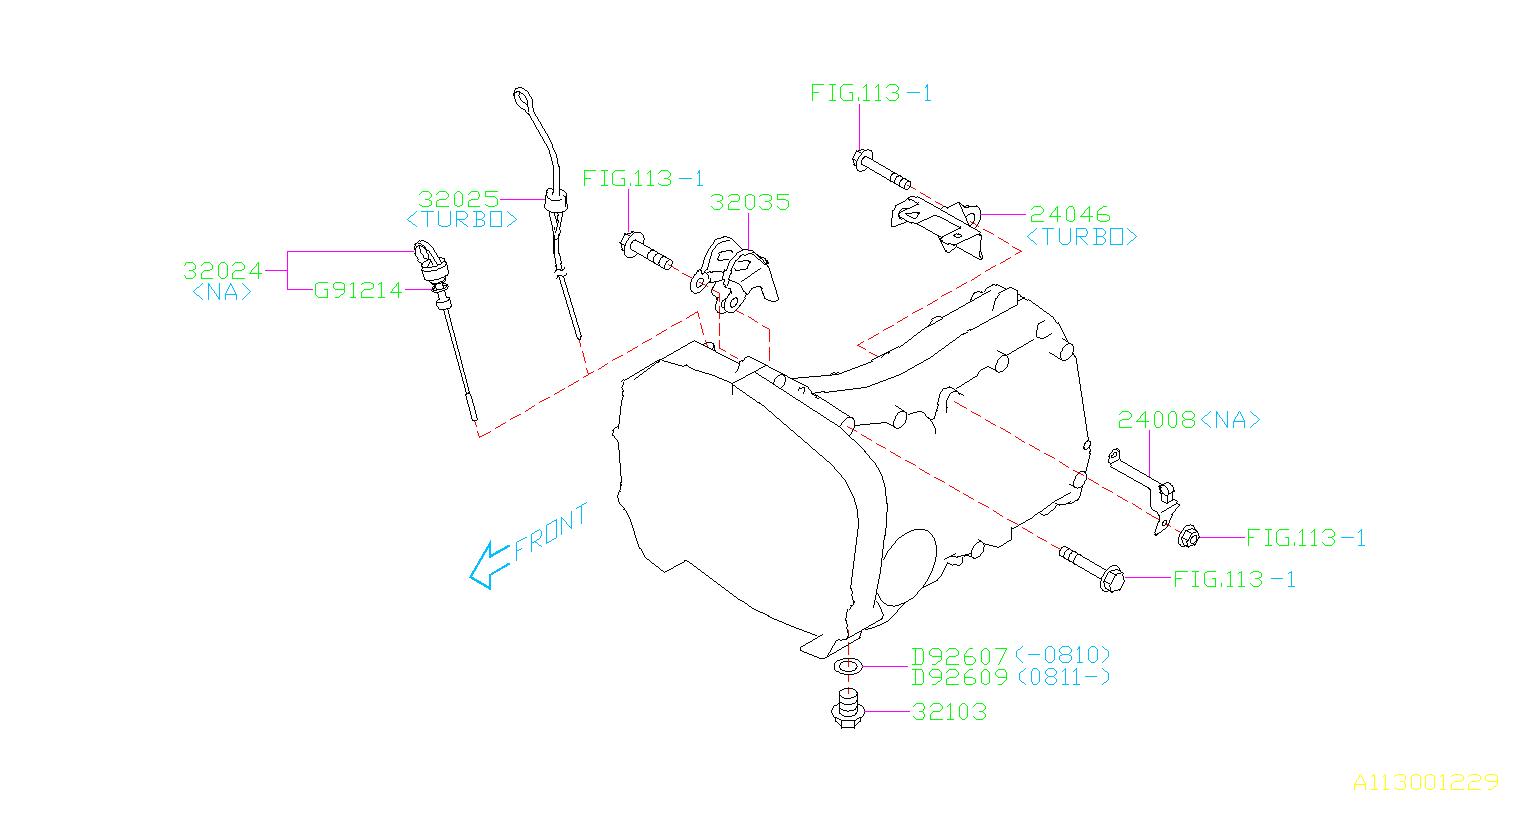 Subaru Impreza Stay Transmission Harness  Manual  Fitting  Case